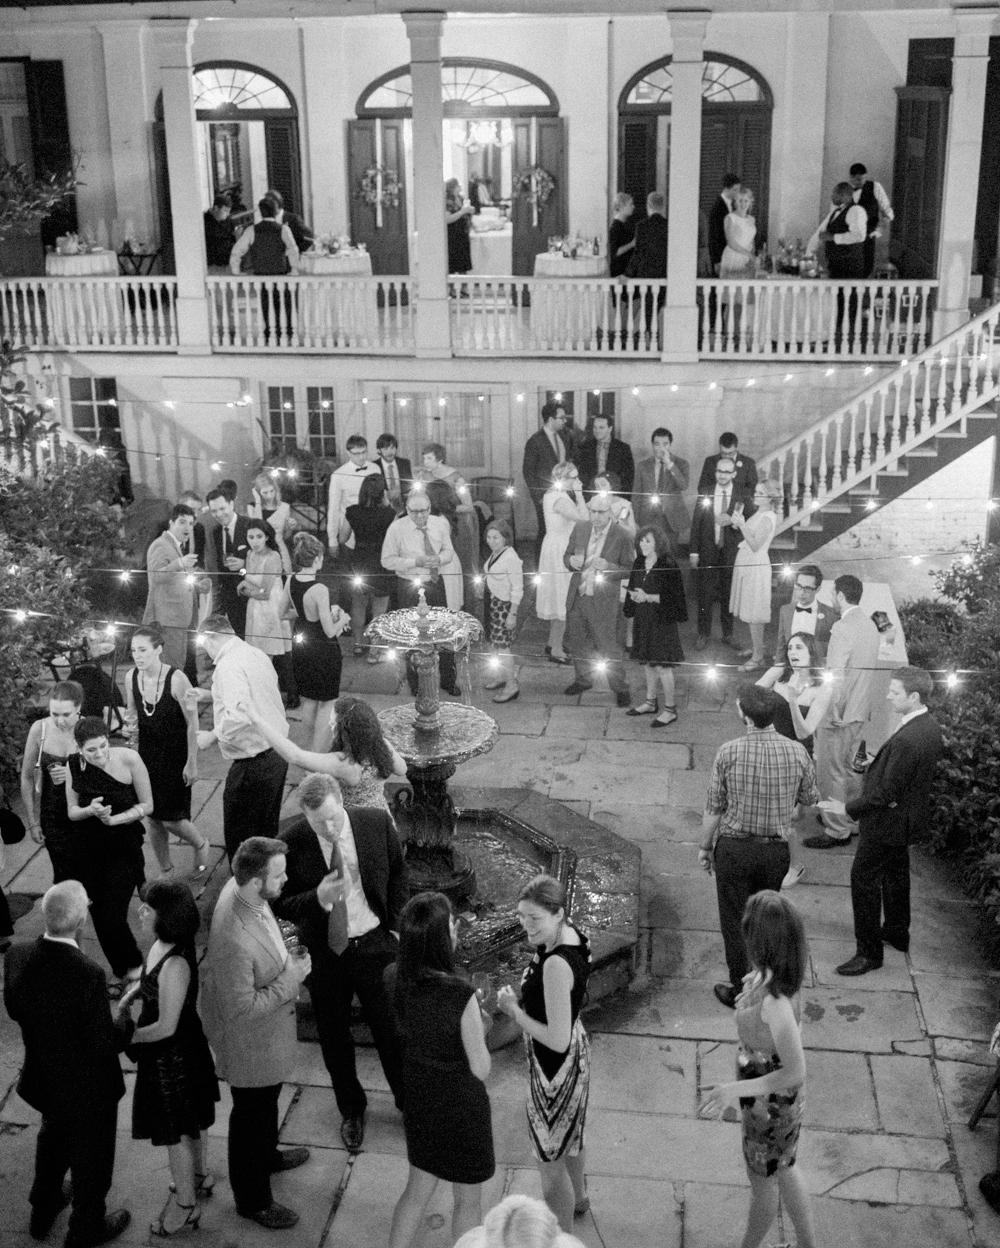 jessica-graham-wedding-courtyard-0099-s112171-0915.jpg